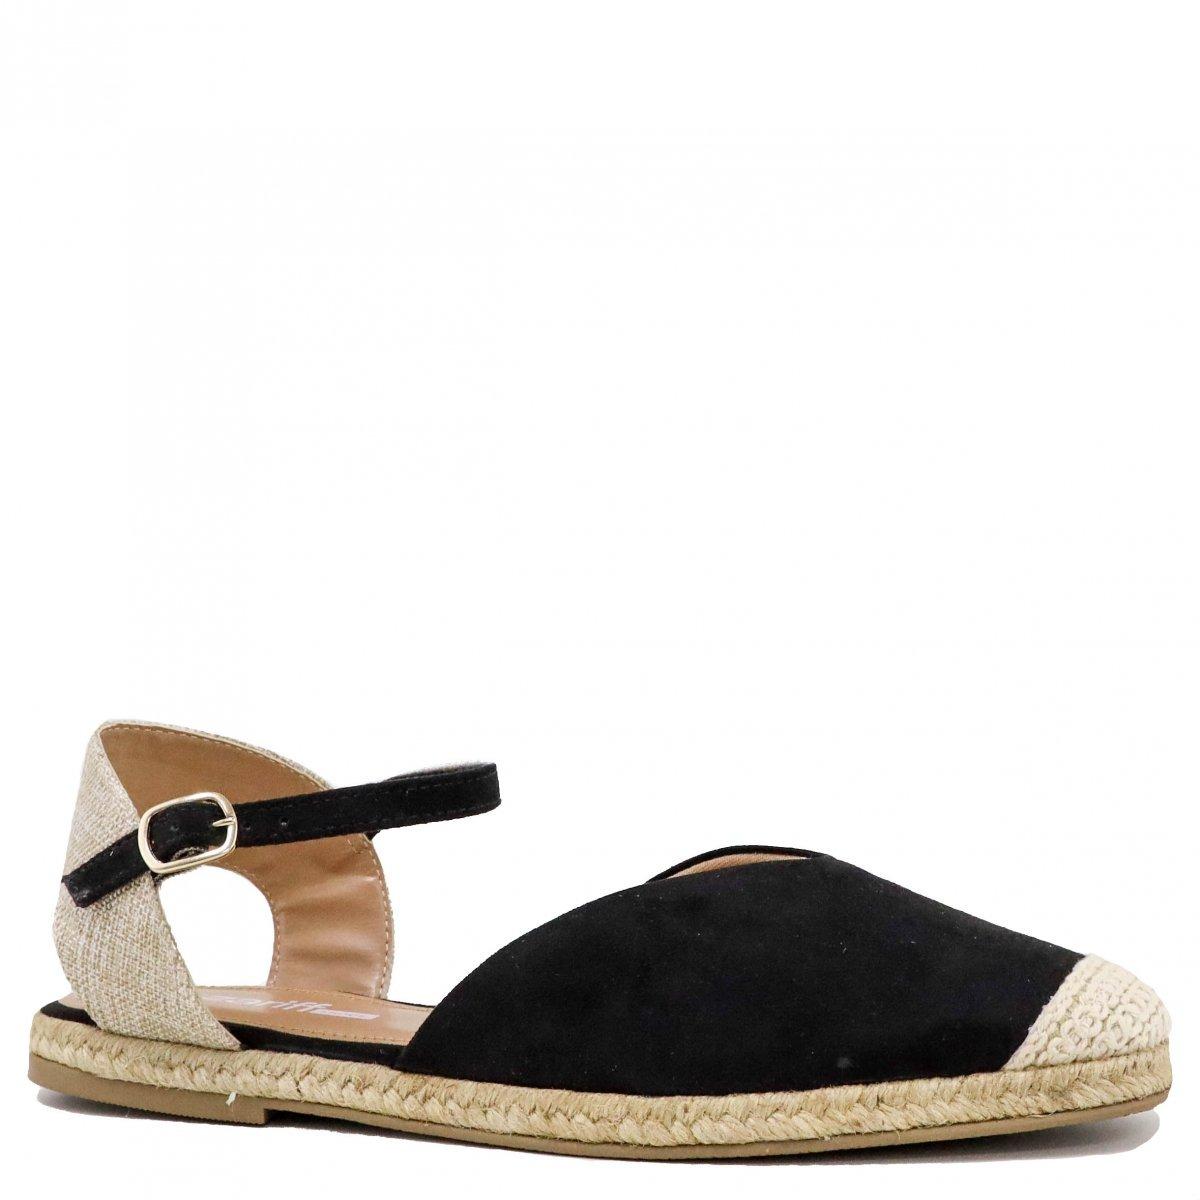 76f3bb9cf Sandália Feminina Zariff Shoes Rasteira Espadrille 810312066 - R  89 ...